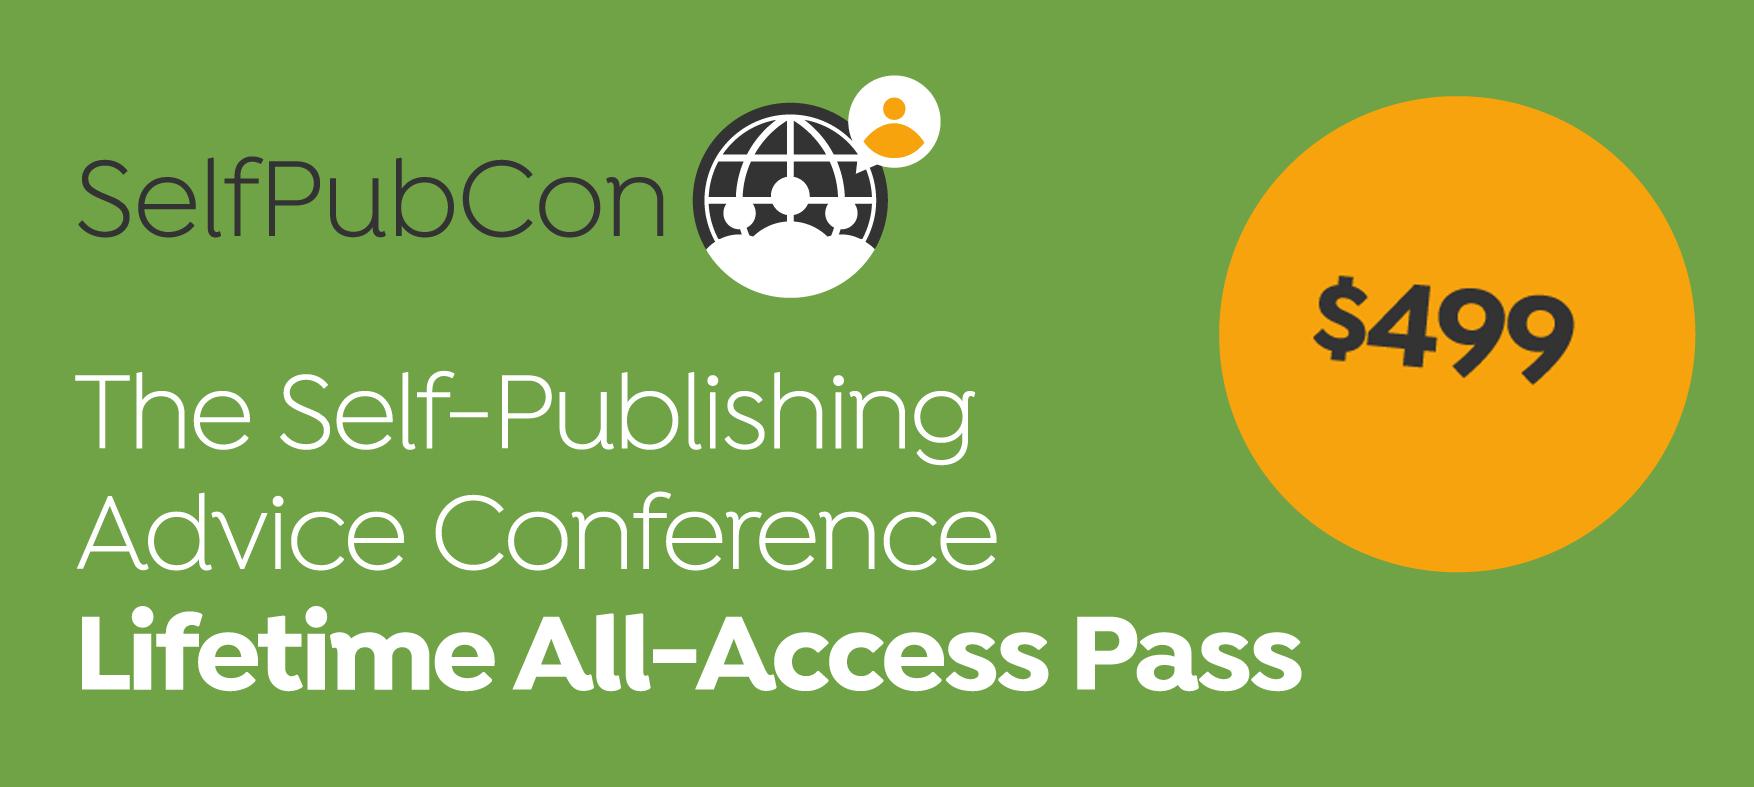 Self-Publishing Advice Conference Lifetime Pass